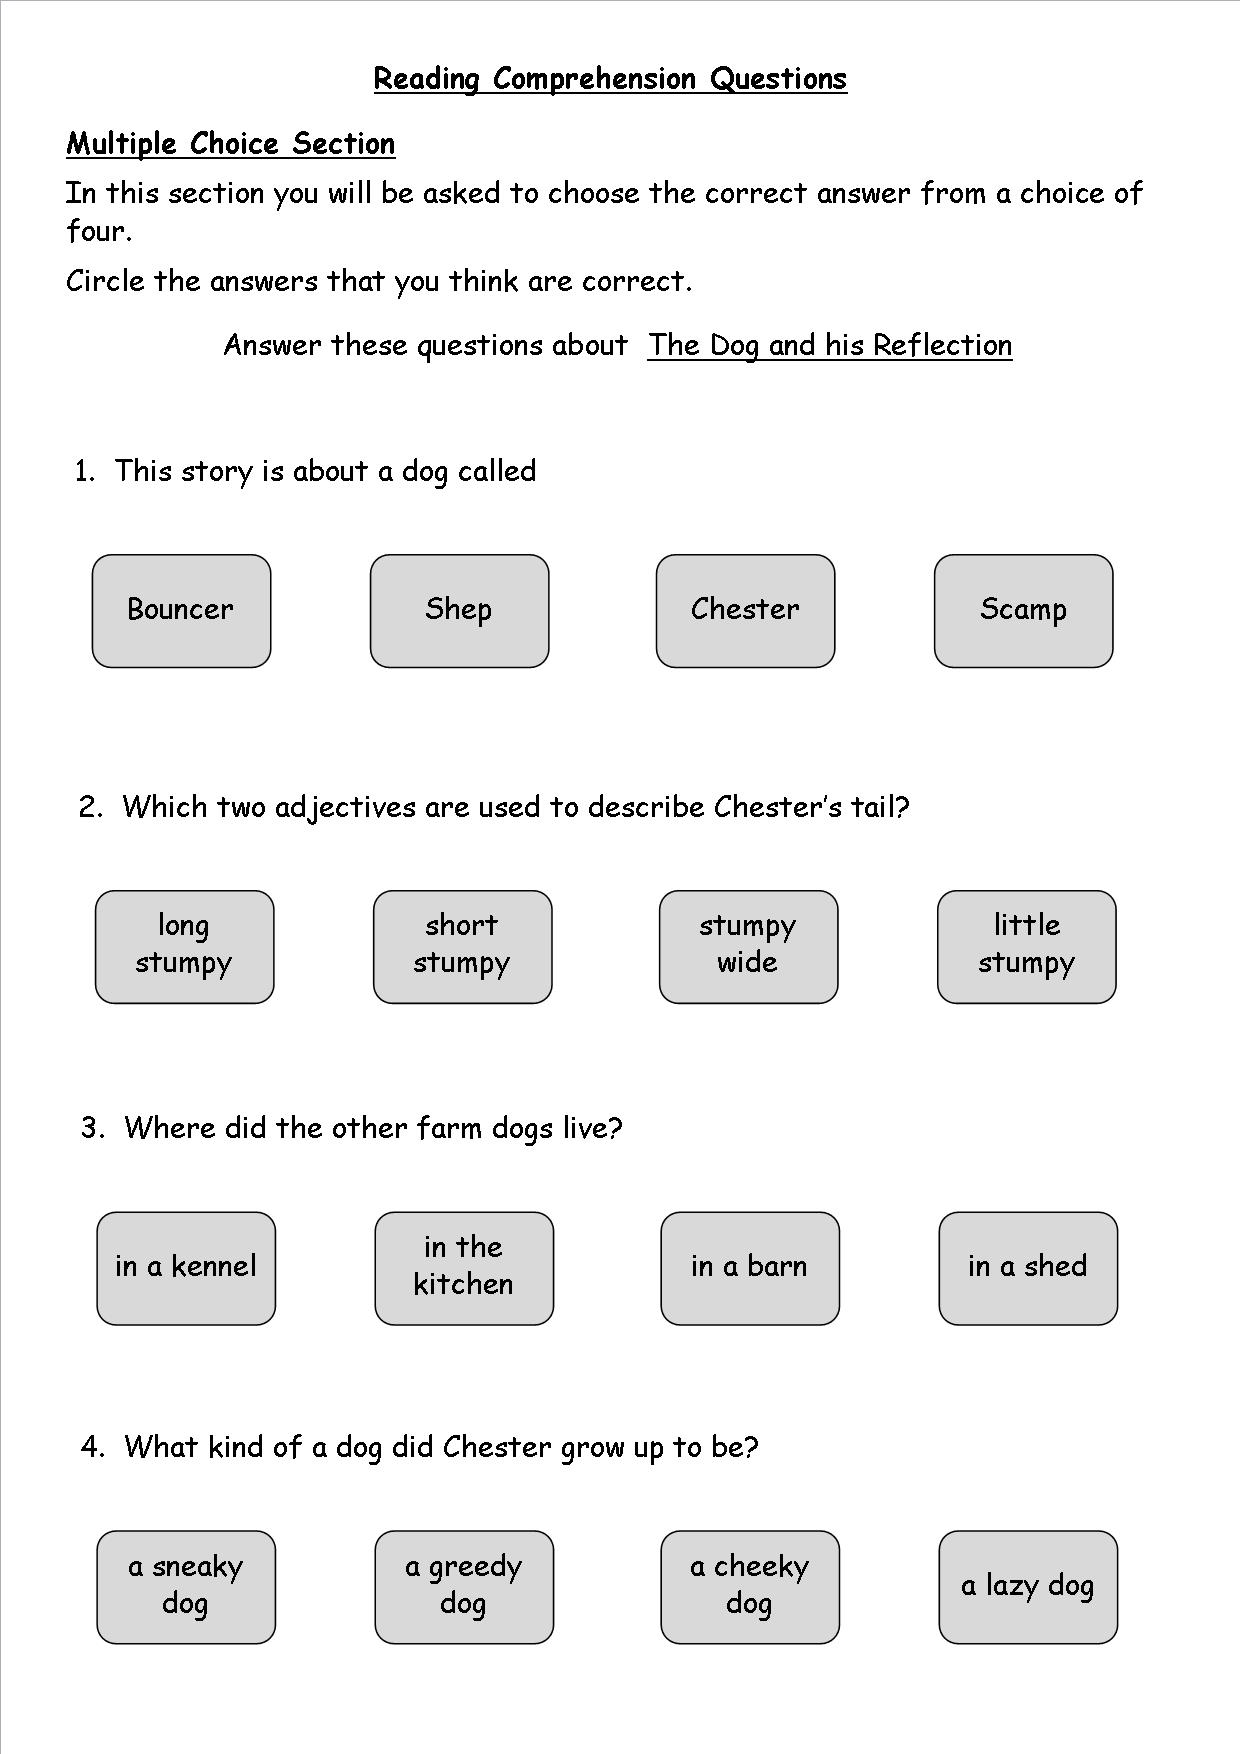 Worksheet Comprehension Questions Ks2 worksheet comprehension questions ks2 mikyu free reading with multiple choice worksheets mais de 1000 1240x1754